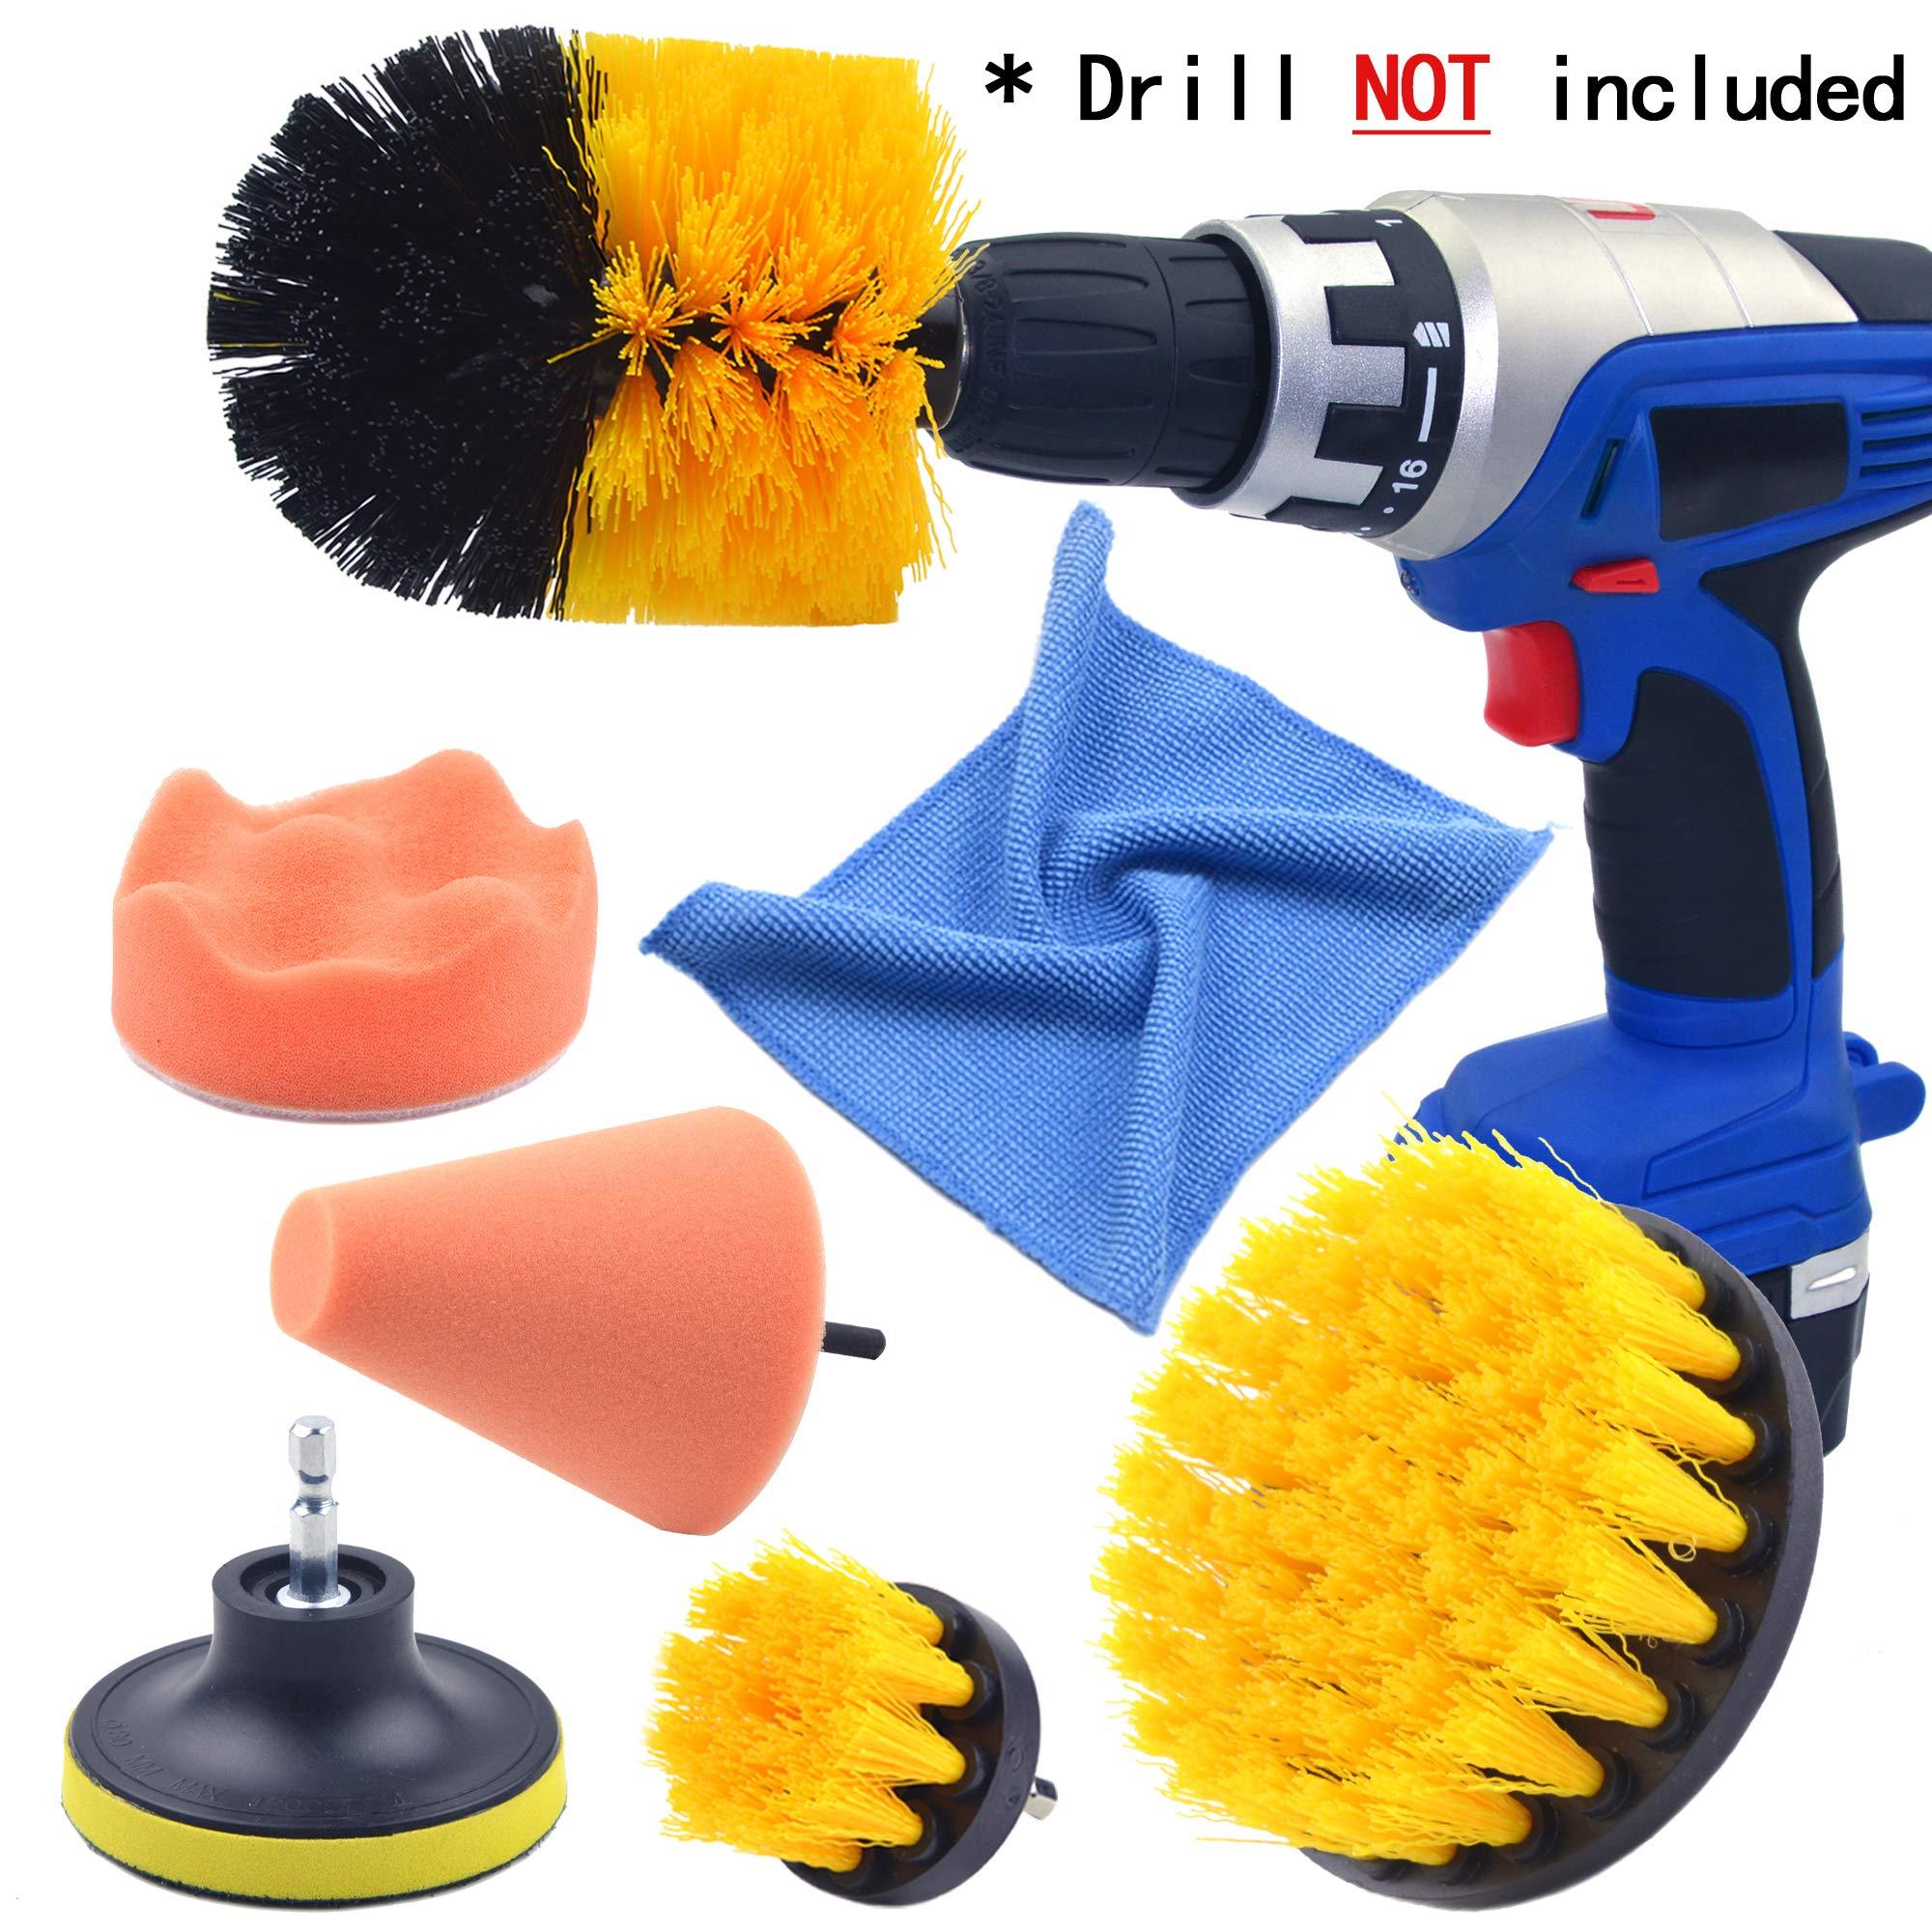 Multipurpose Drill Brush Scrubber Cleaning Set for Car Wheels, Car Seats, Car Carpet Medium Stiff Brushes, Car Wave Polishing Sponge, Wheels Tiles Hubs Care Power Cone Buffing Sponge, 6PCS/Set